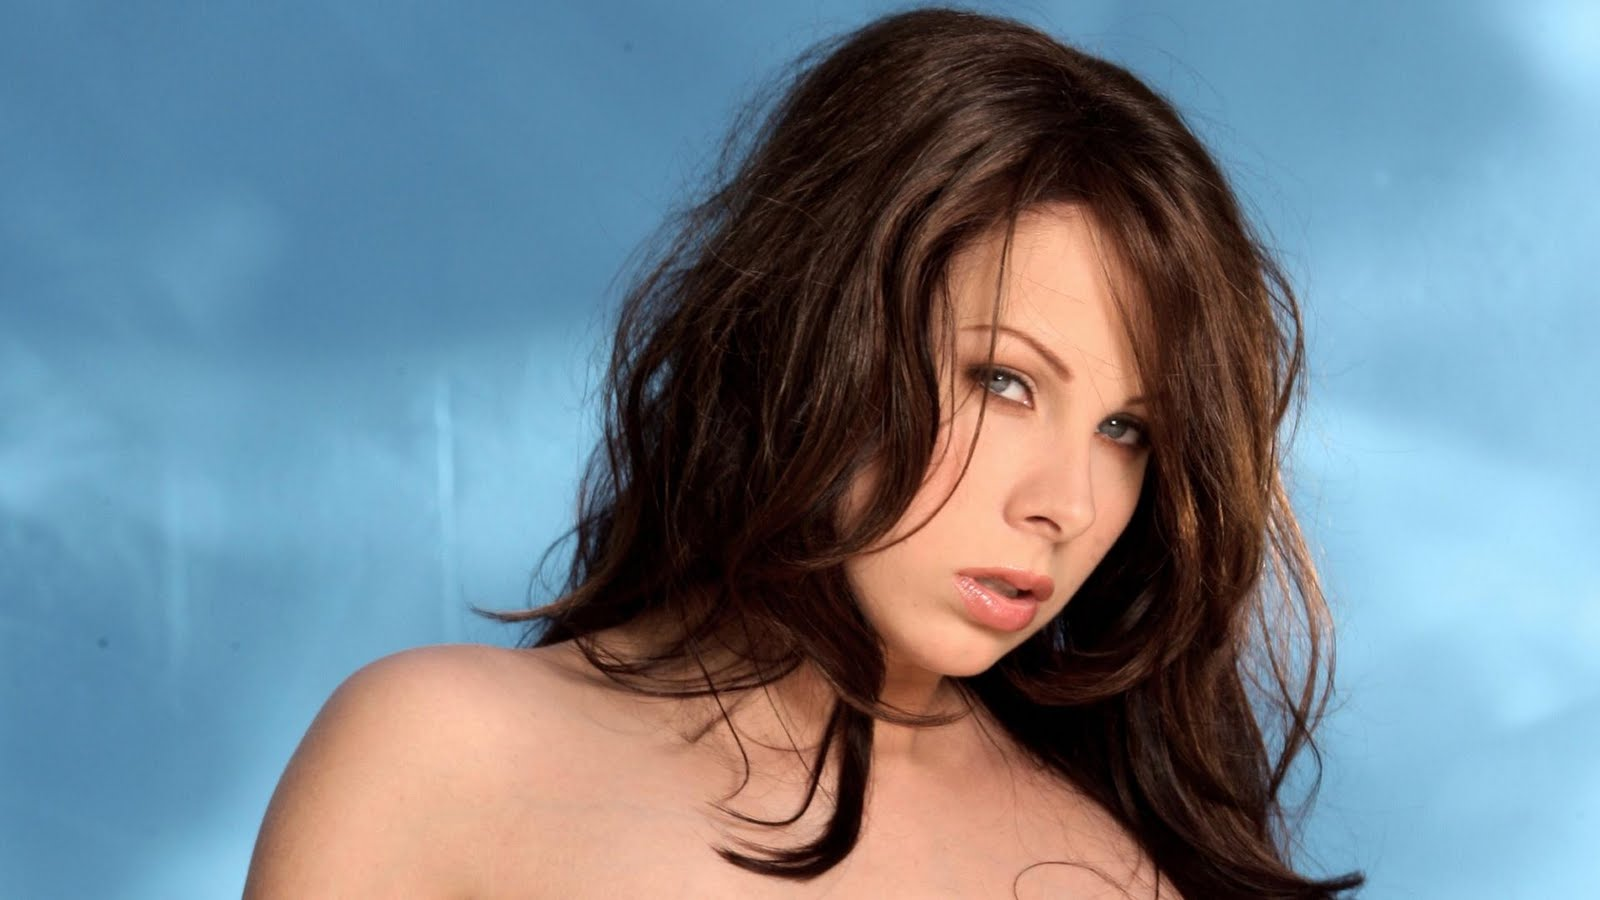 Porn Stars Like Gianna Michaels